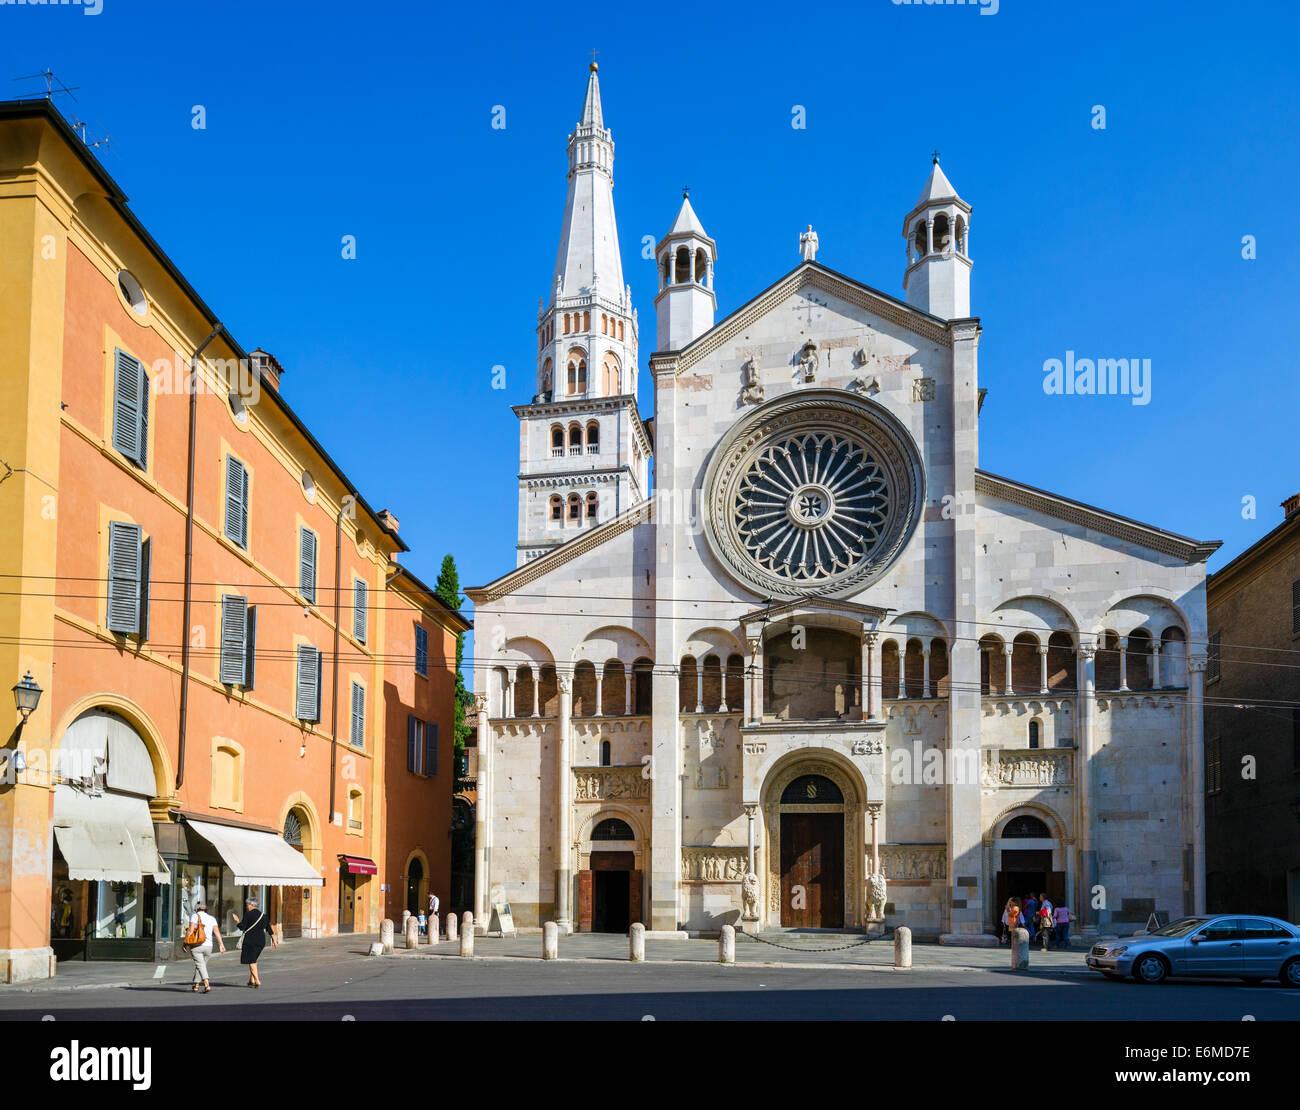 Die Westfassade des Duomo, Piazza Duomo, Modena, Emilia Romagna, Italien Stockbild